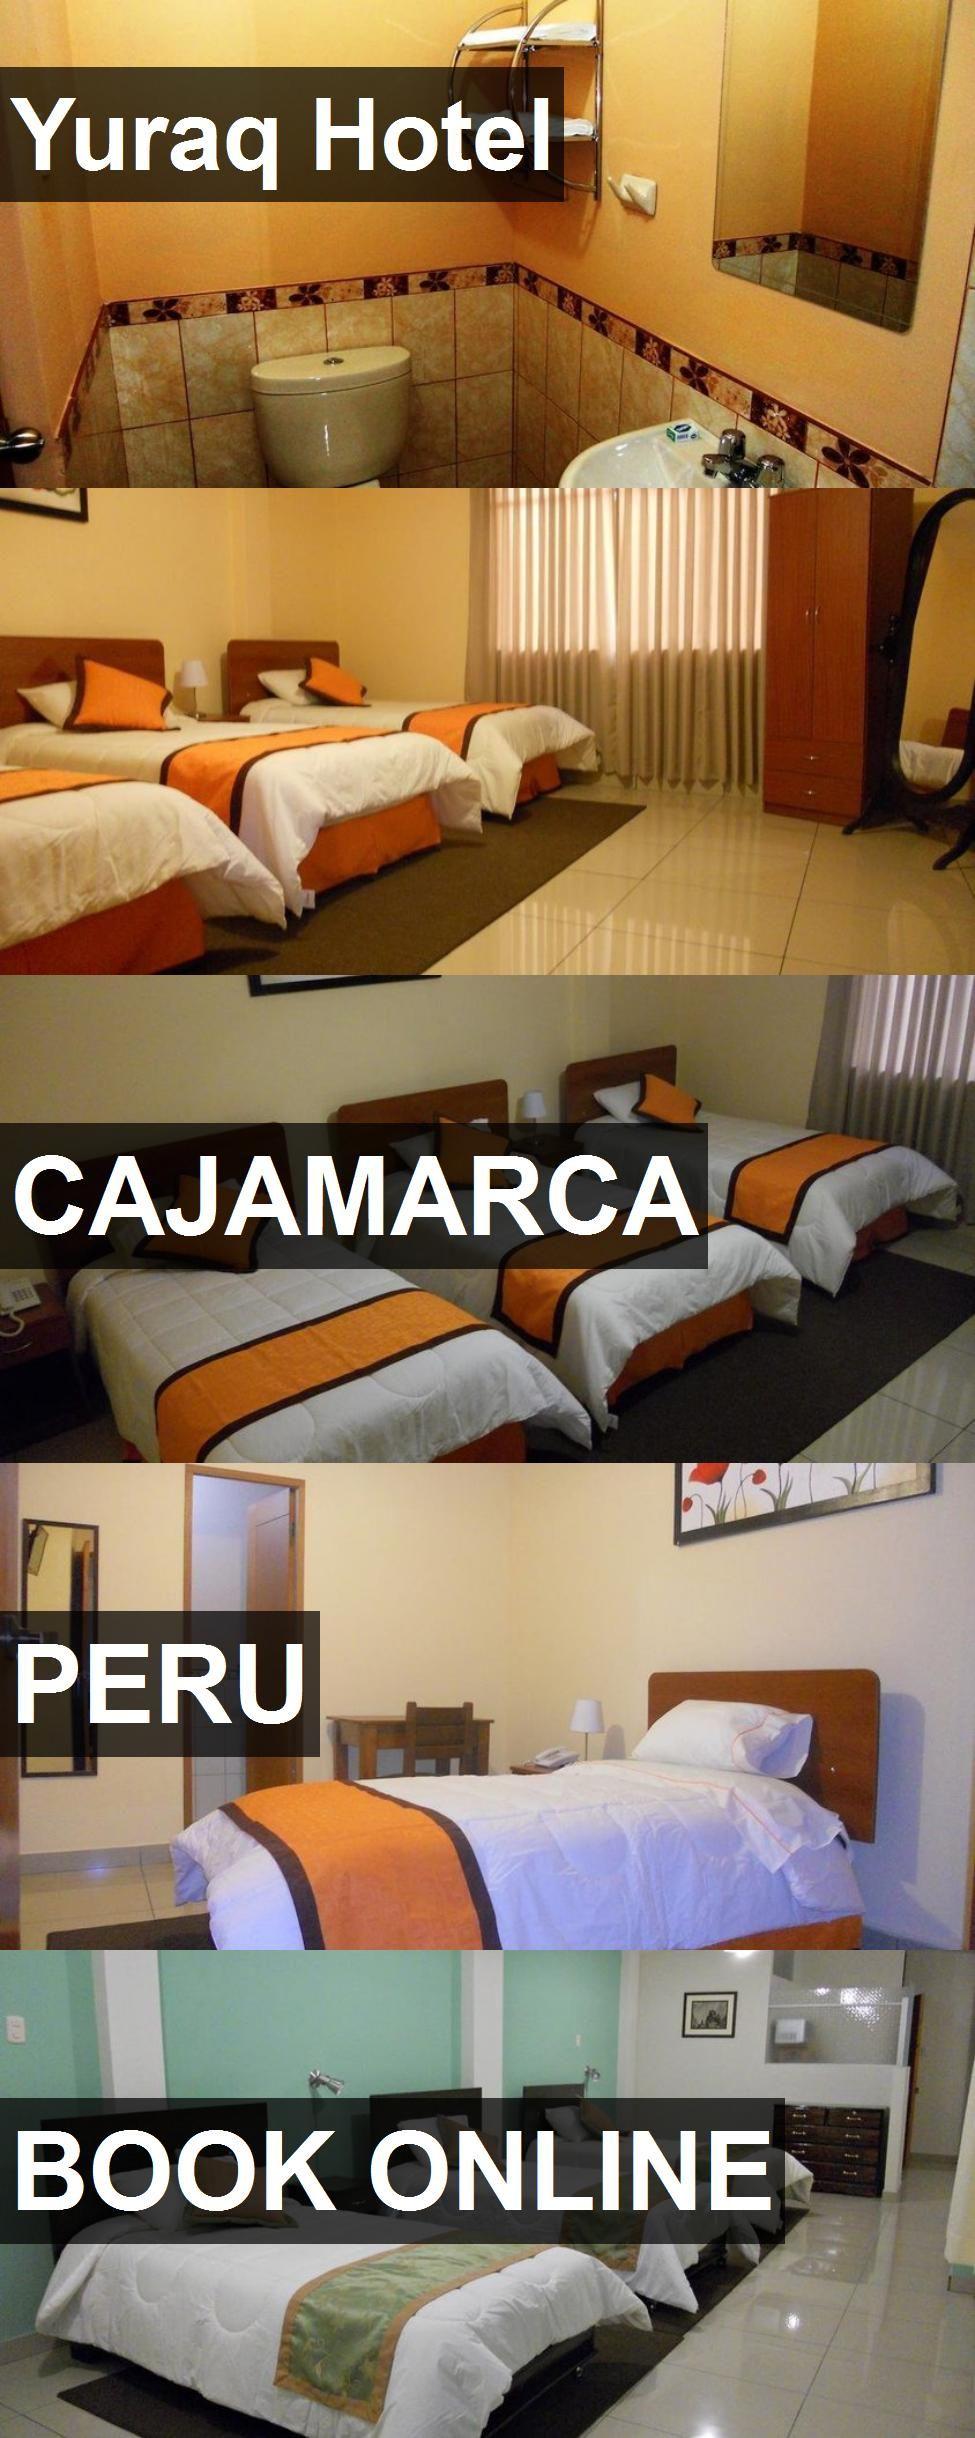 Yuraq Hotel in Cajamarca, Peru. For more information